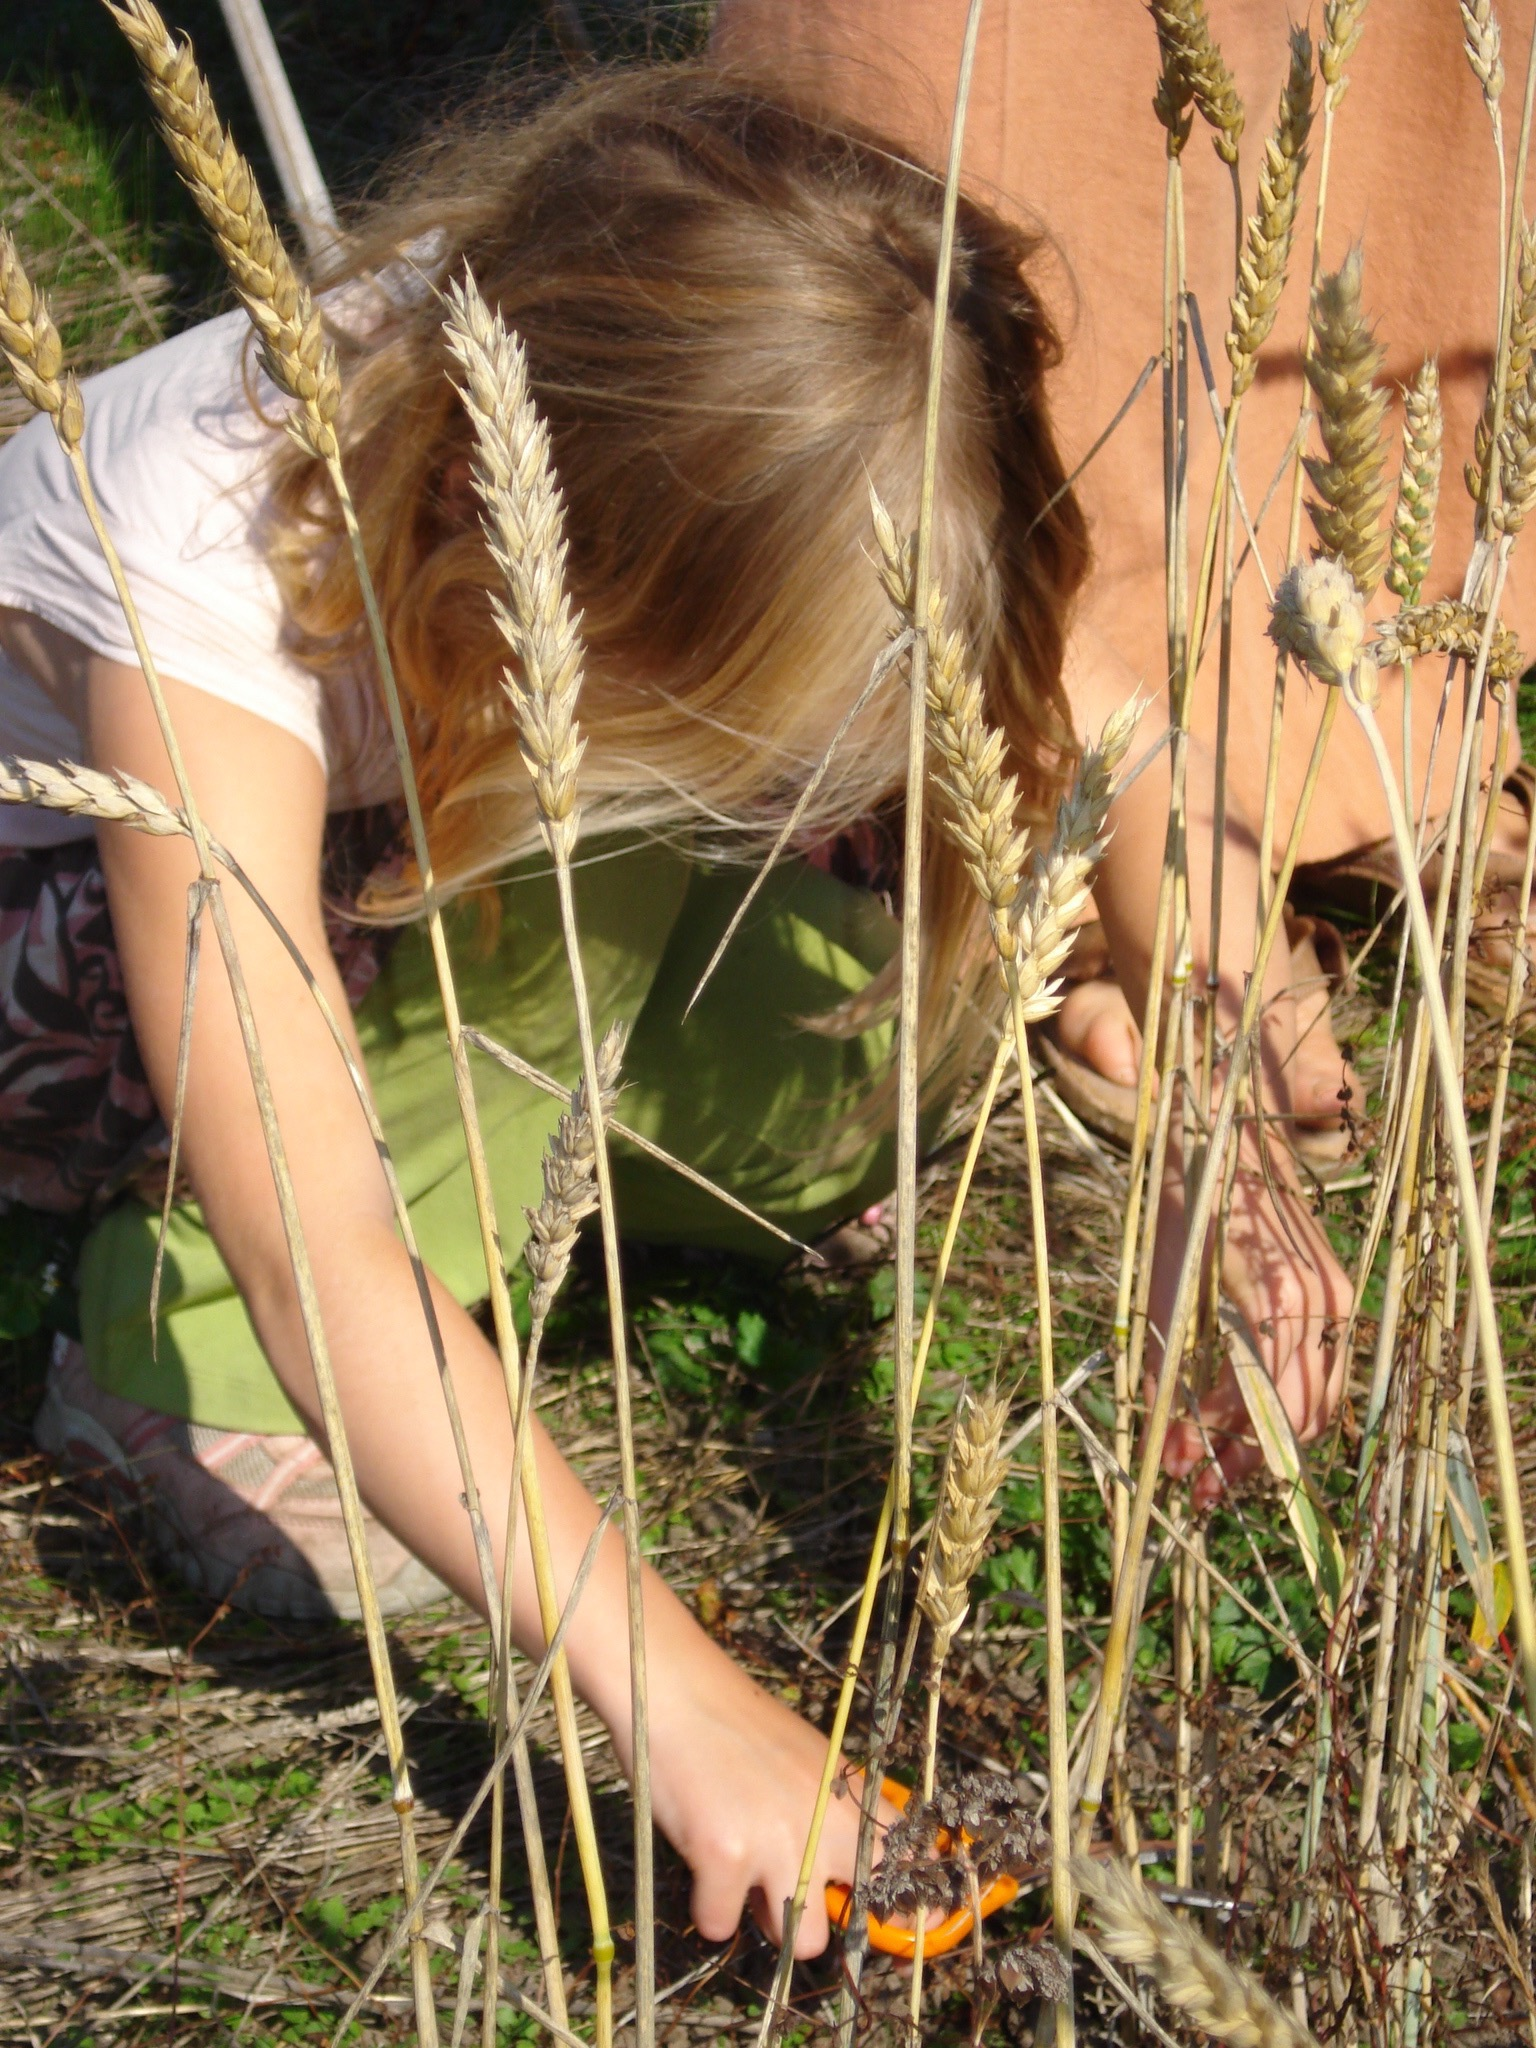 Harvesting wheat with kiddie scissors